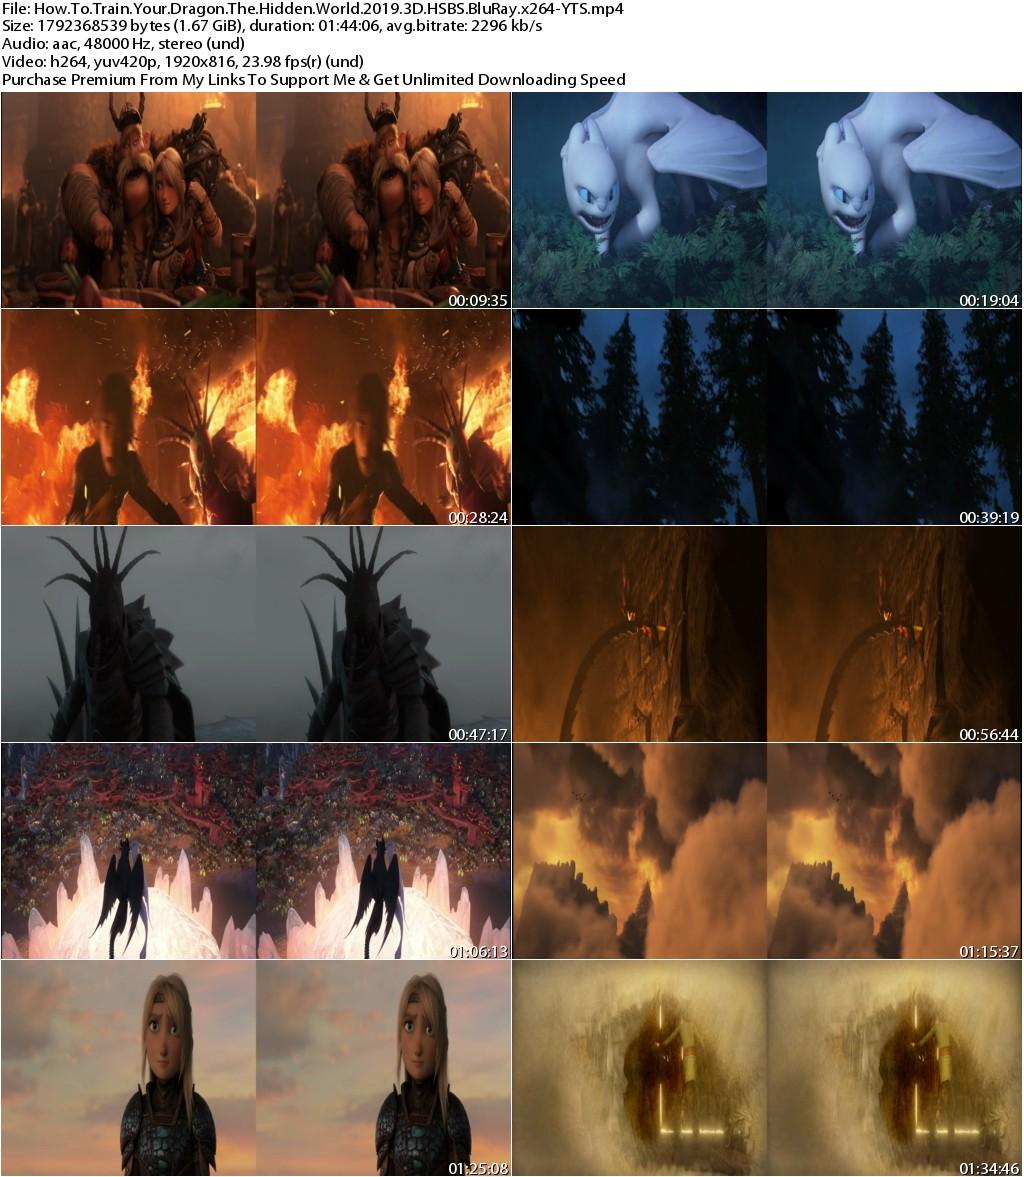 How To Train Your Dragon The Hidden World (2019) 3D HSBS 1080p BluRay x264-YTS